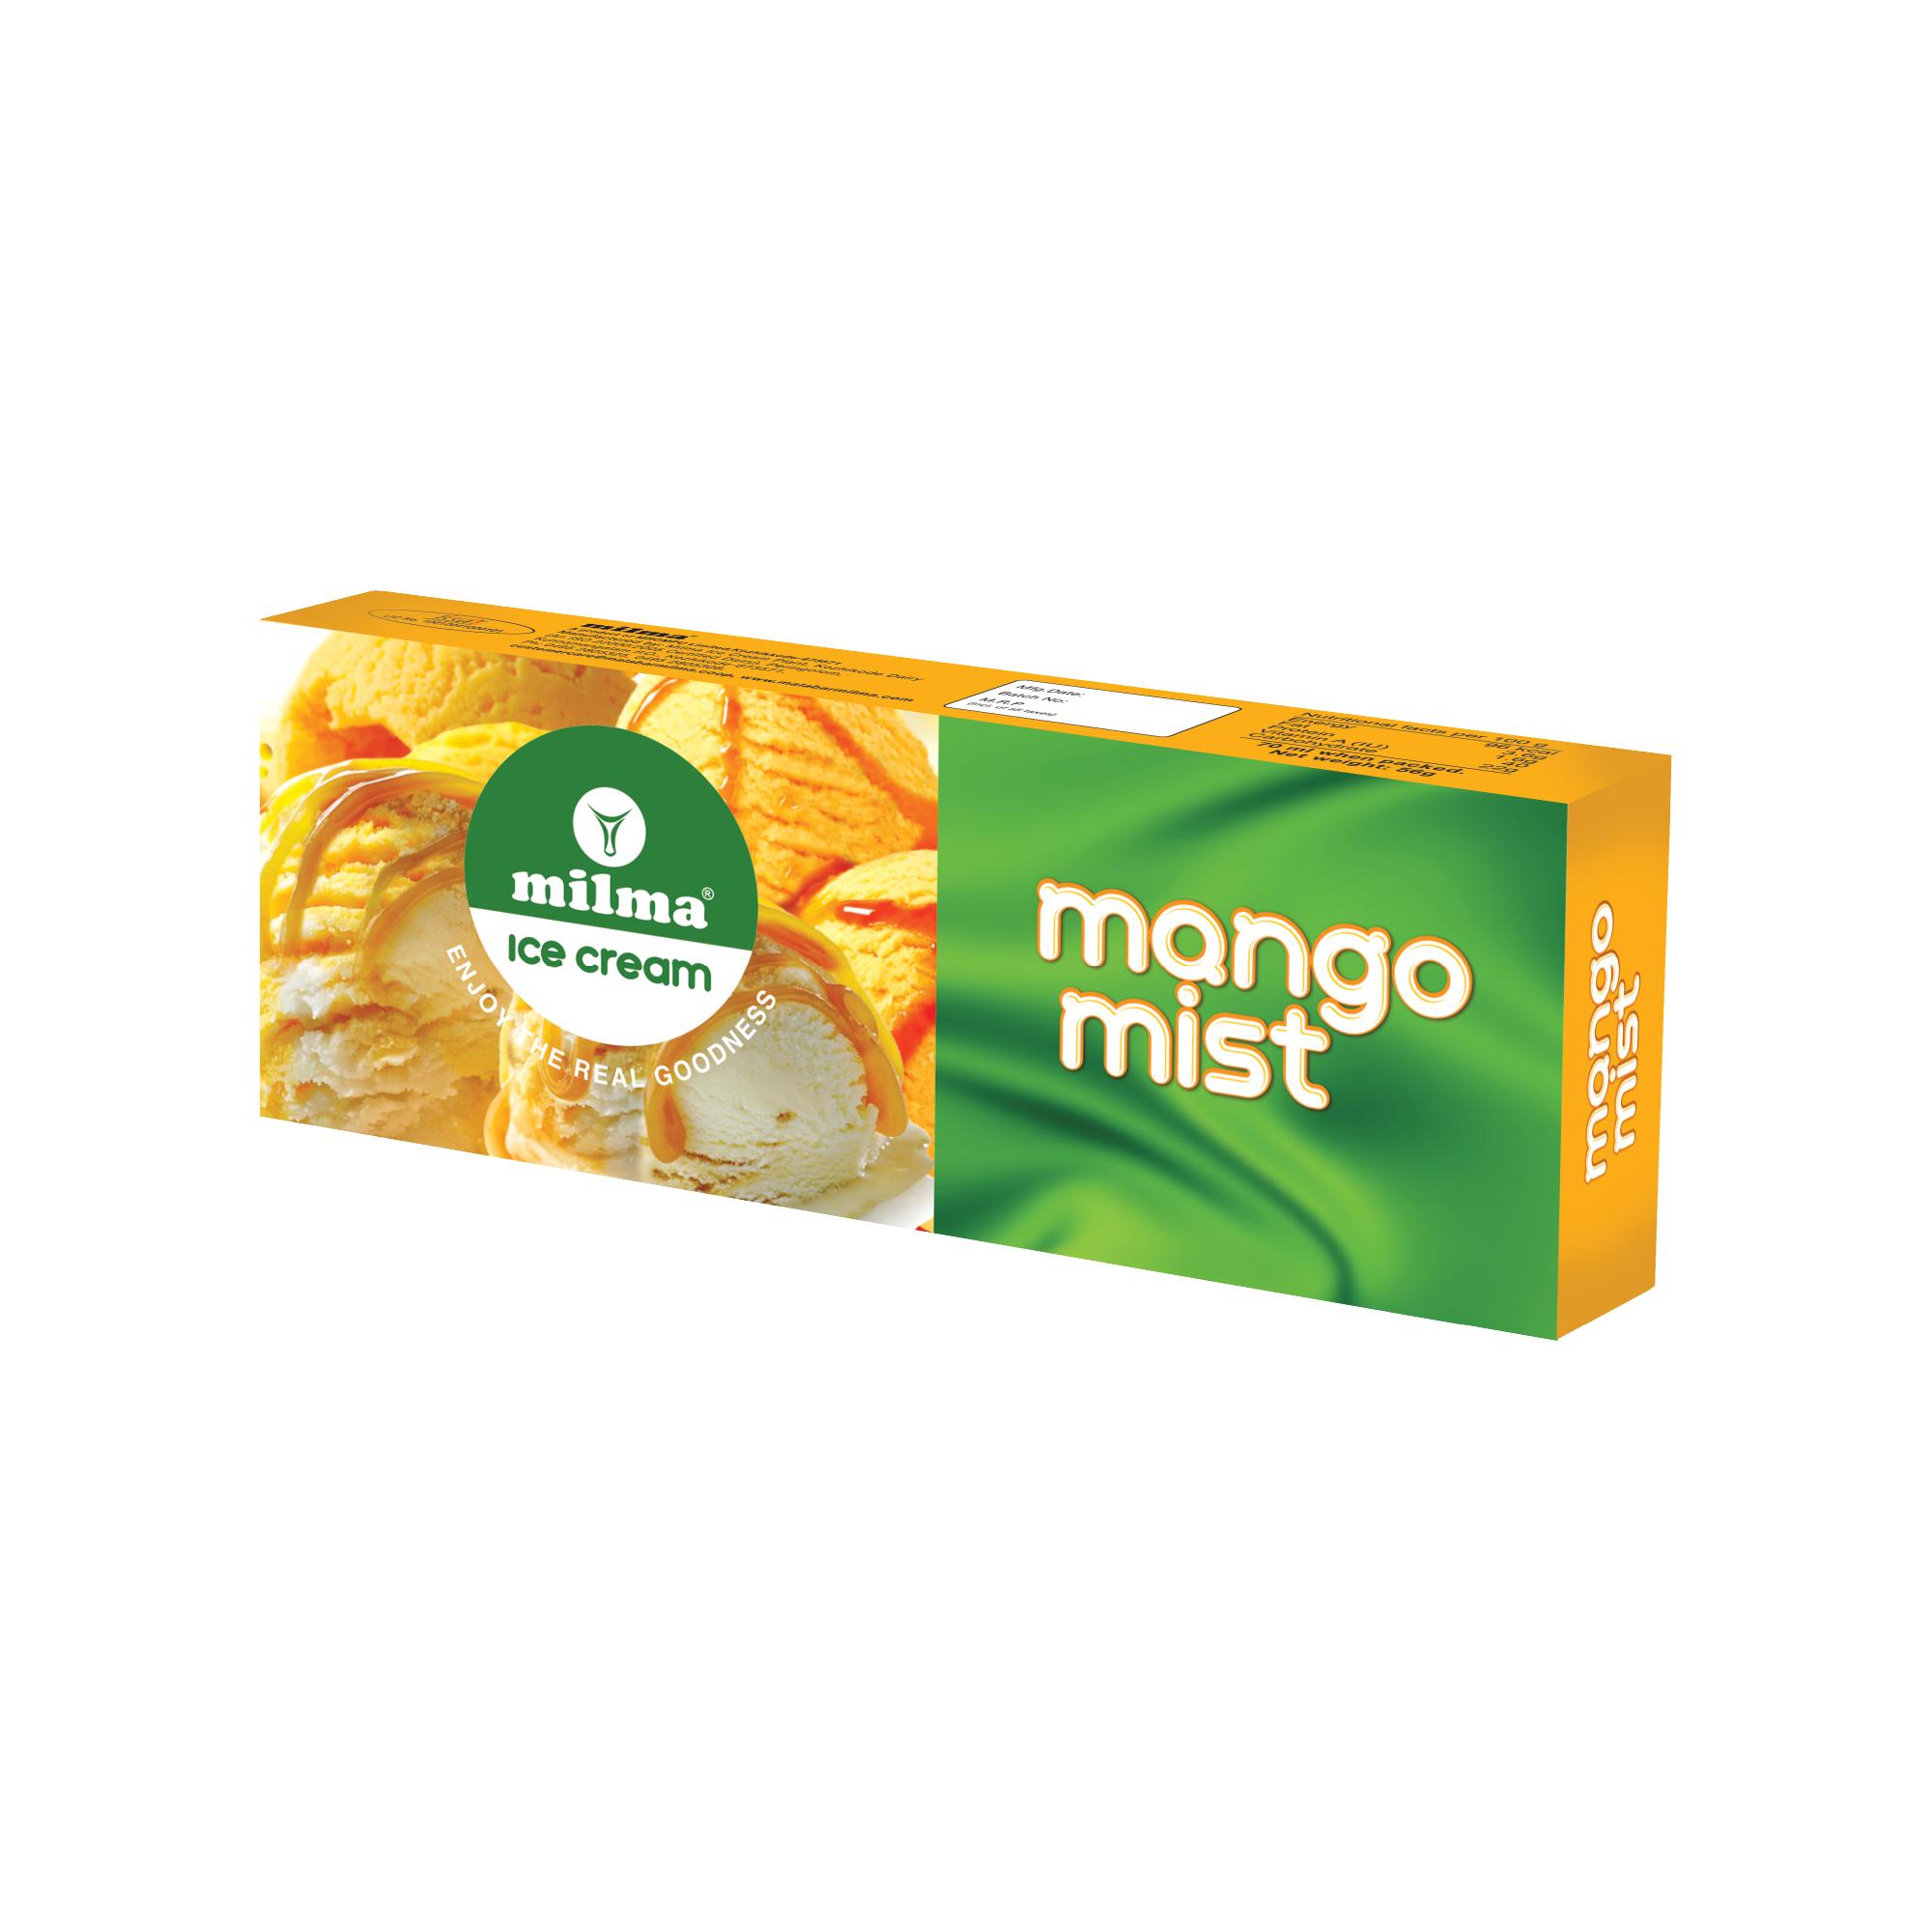 Mango Mist